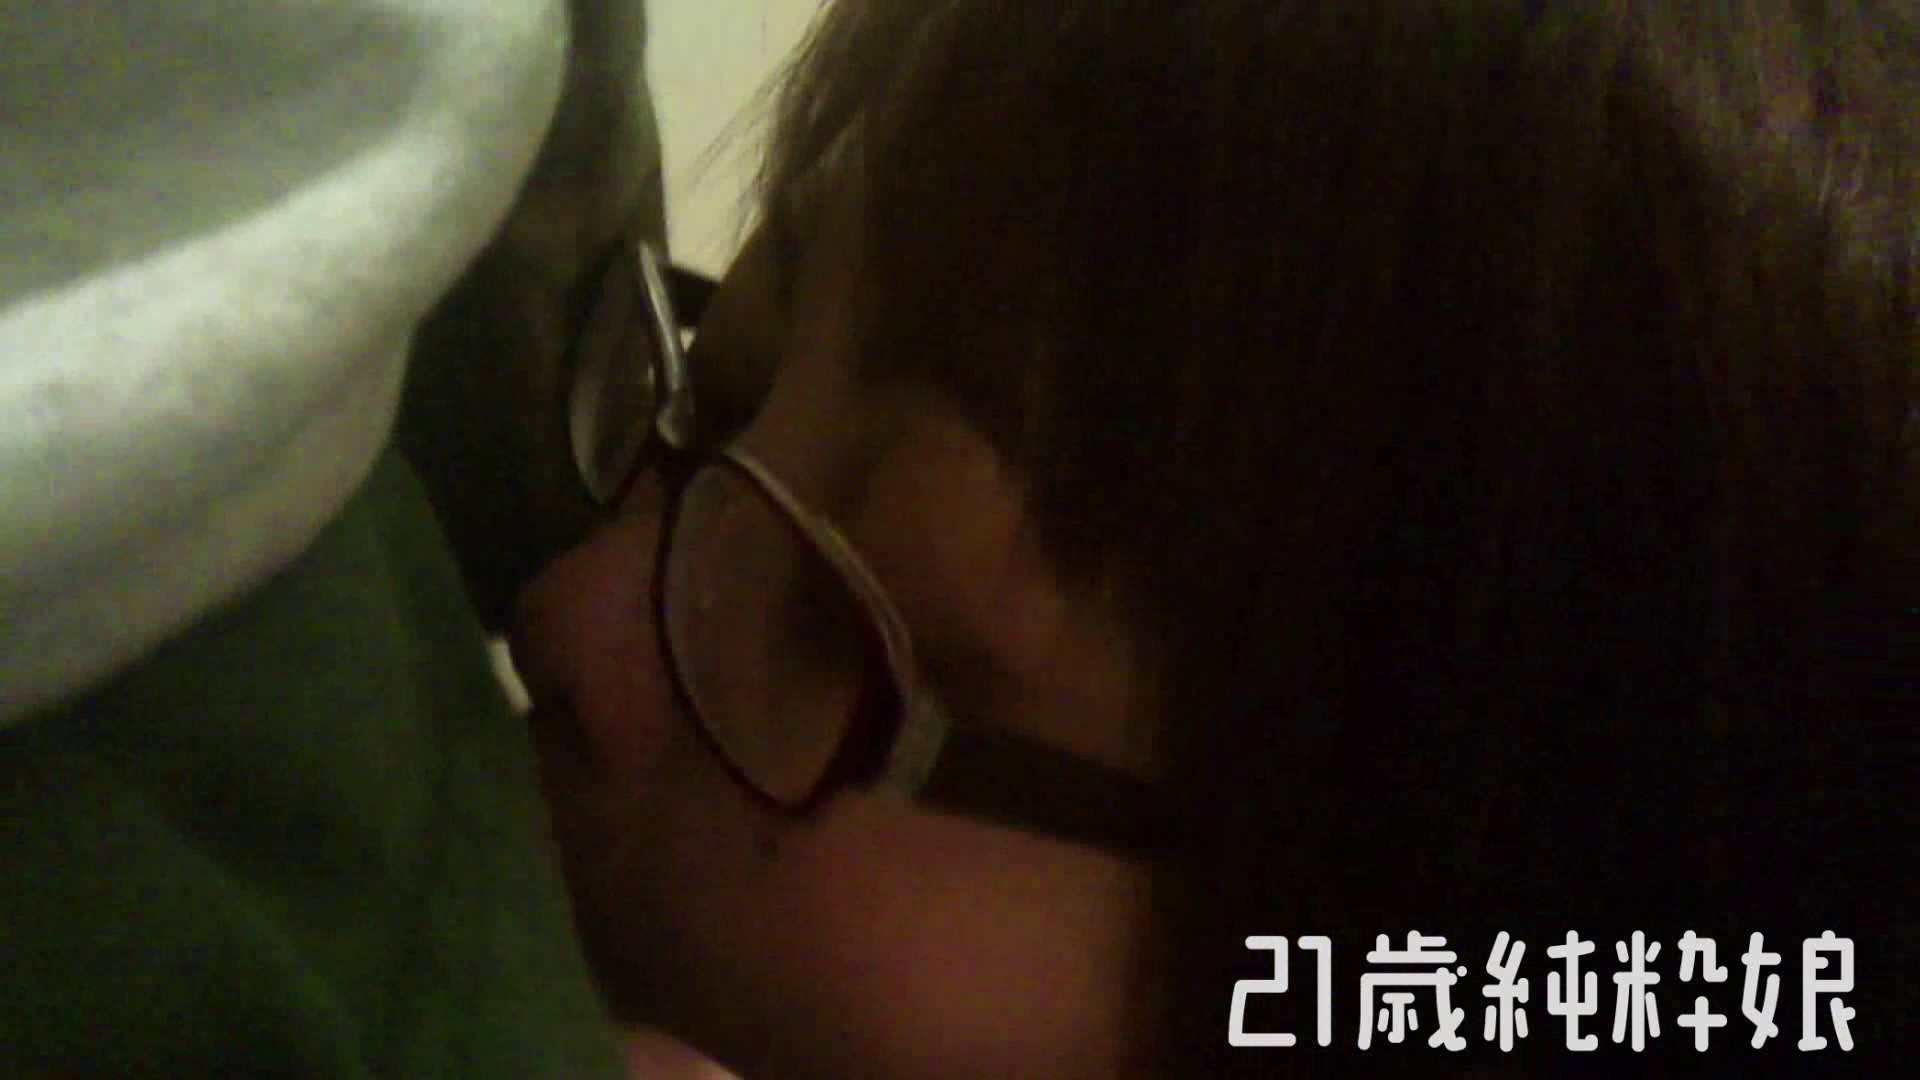 Gカップ21歳純粋嬢第2弾Vol.5 OLヌード天国 | 学校  110PIX 47